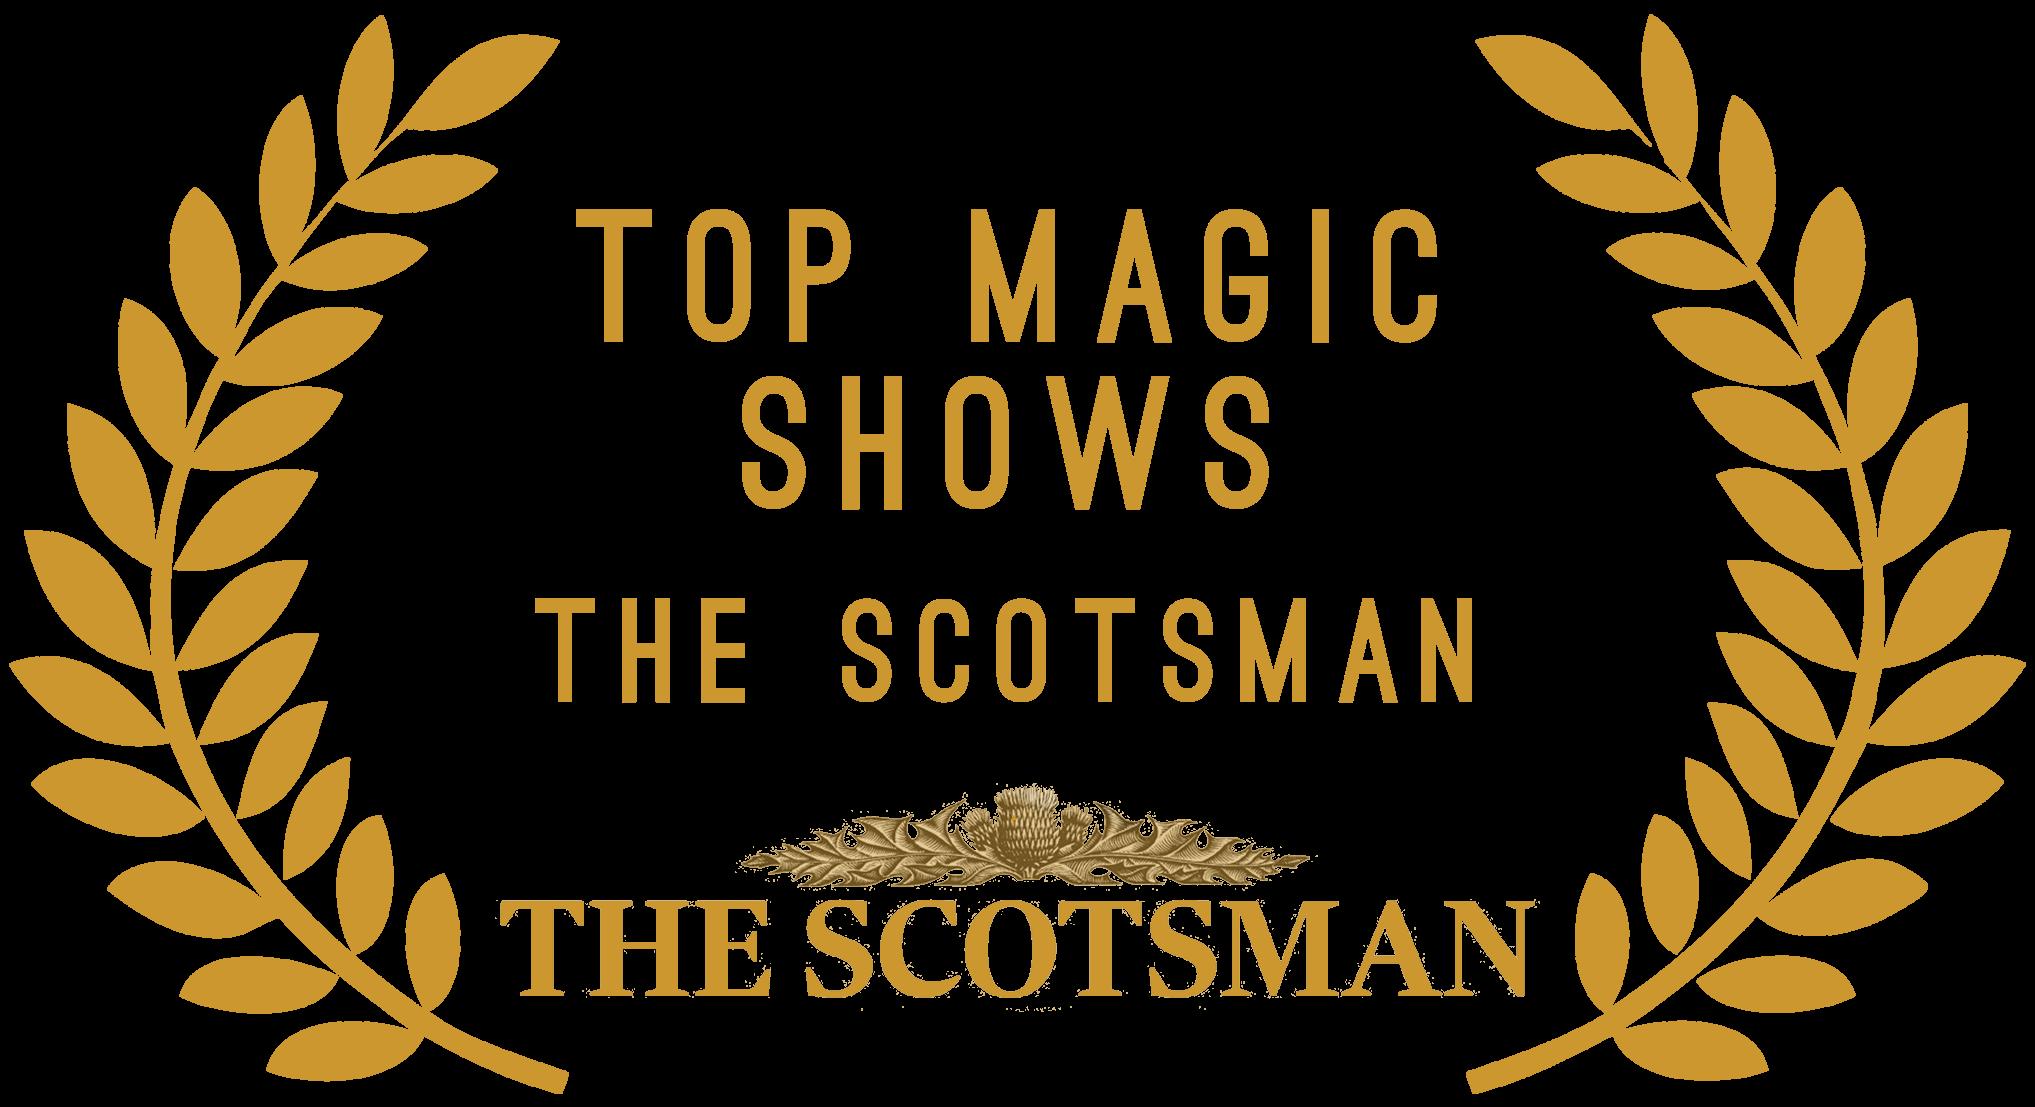 The scotsman top magic show award for Manchester magician Aaron Calvert